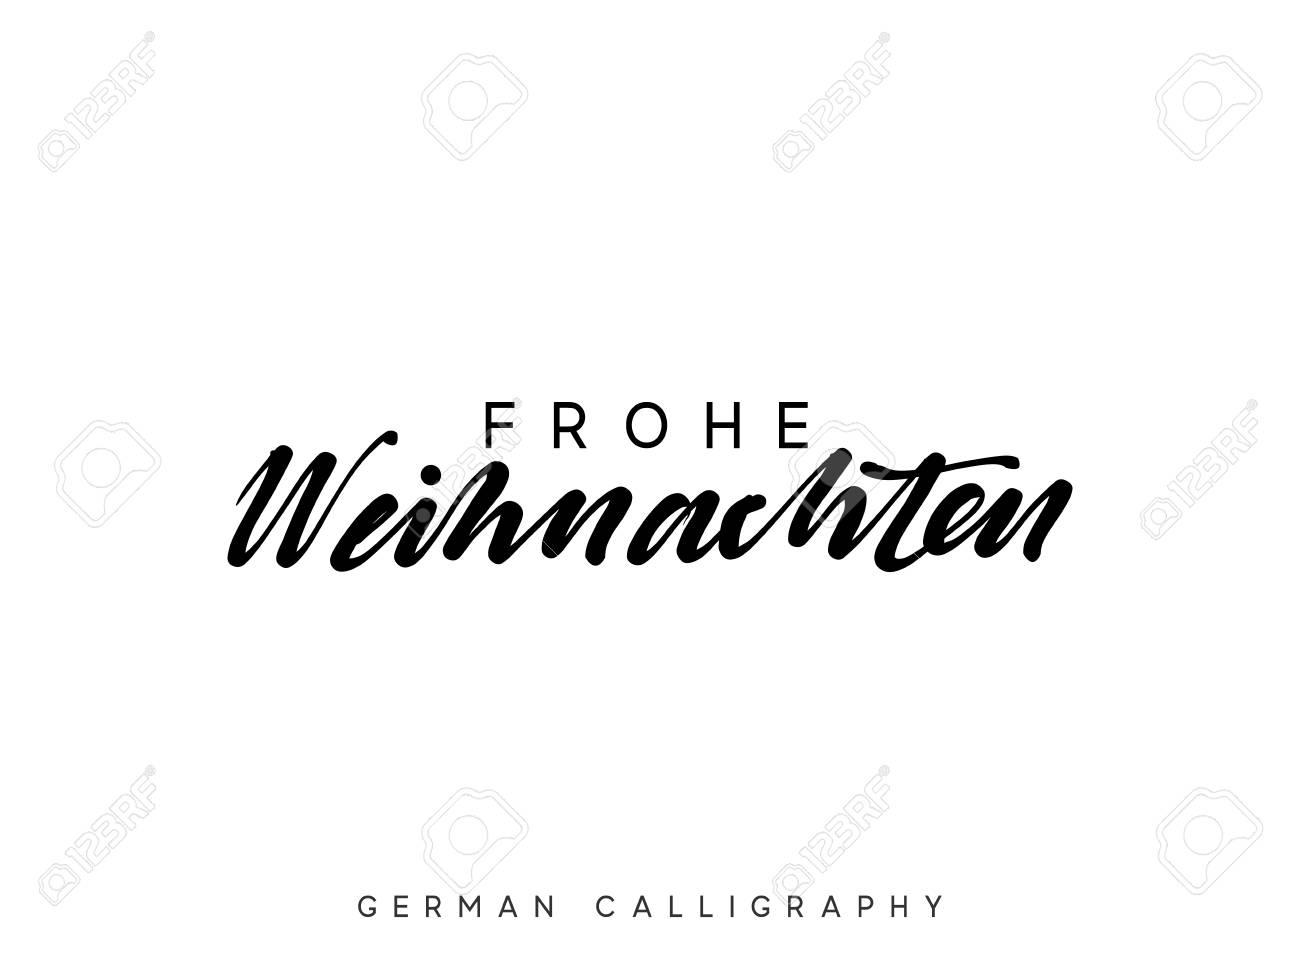 Text Frohe Weihnachten.German Text Frohe Weihnachten Merry Christmas Hand Drawn Calligraphy